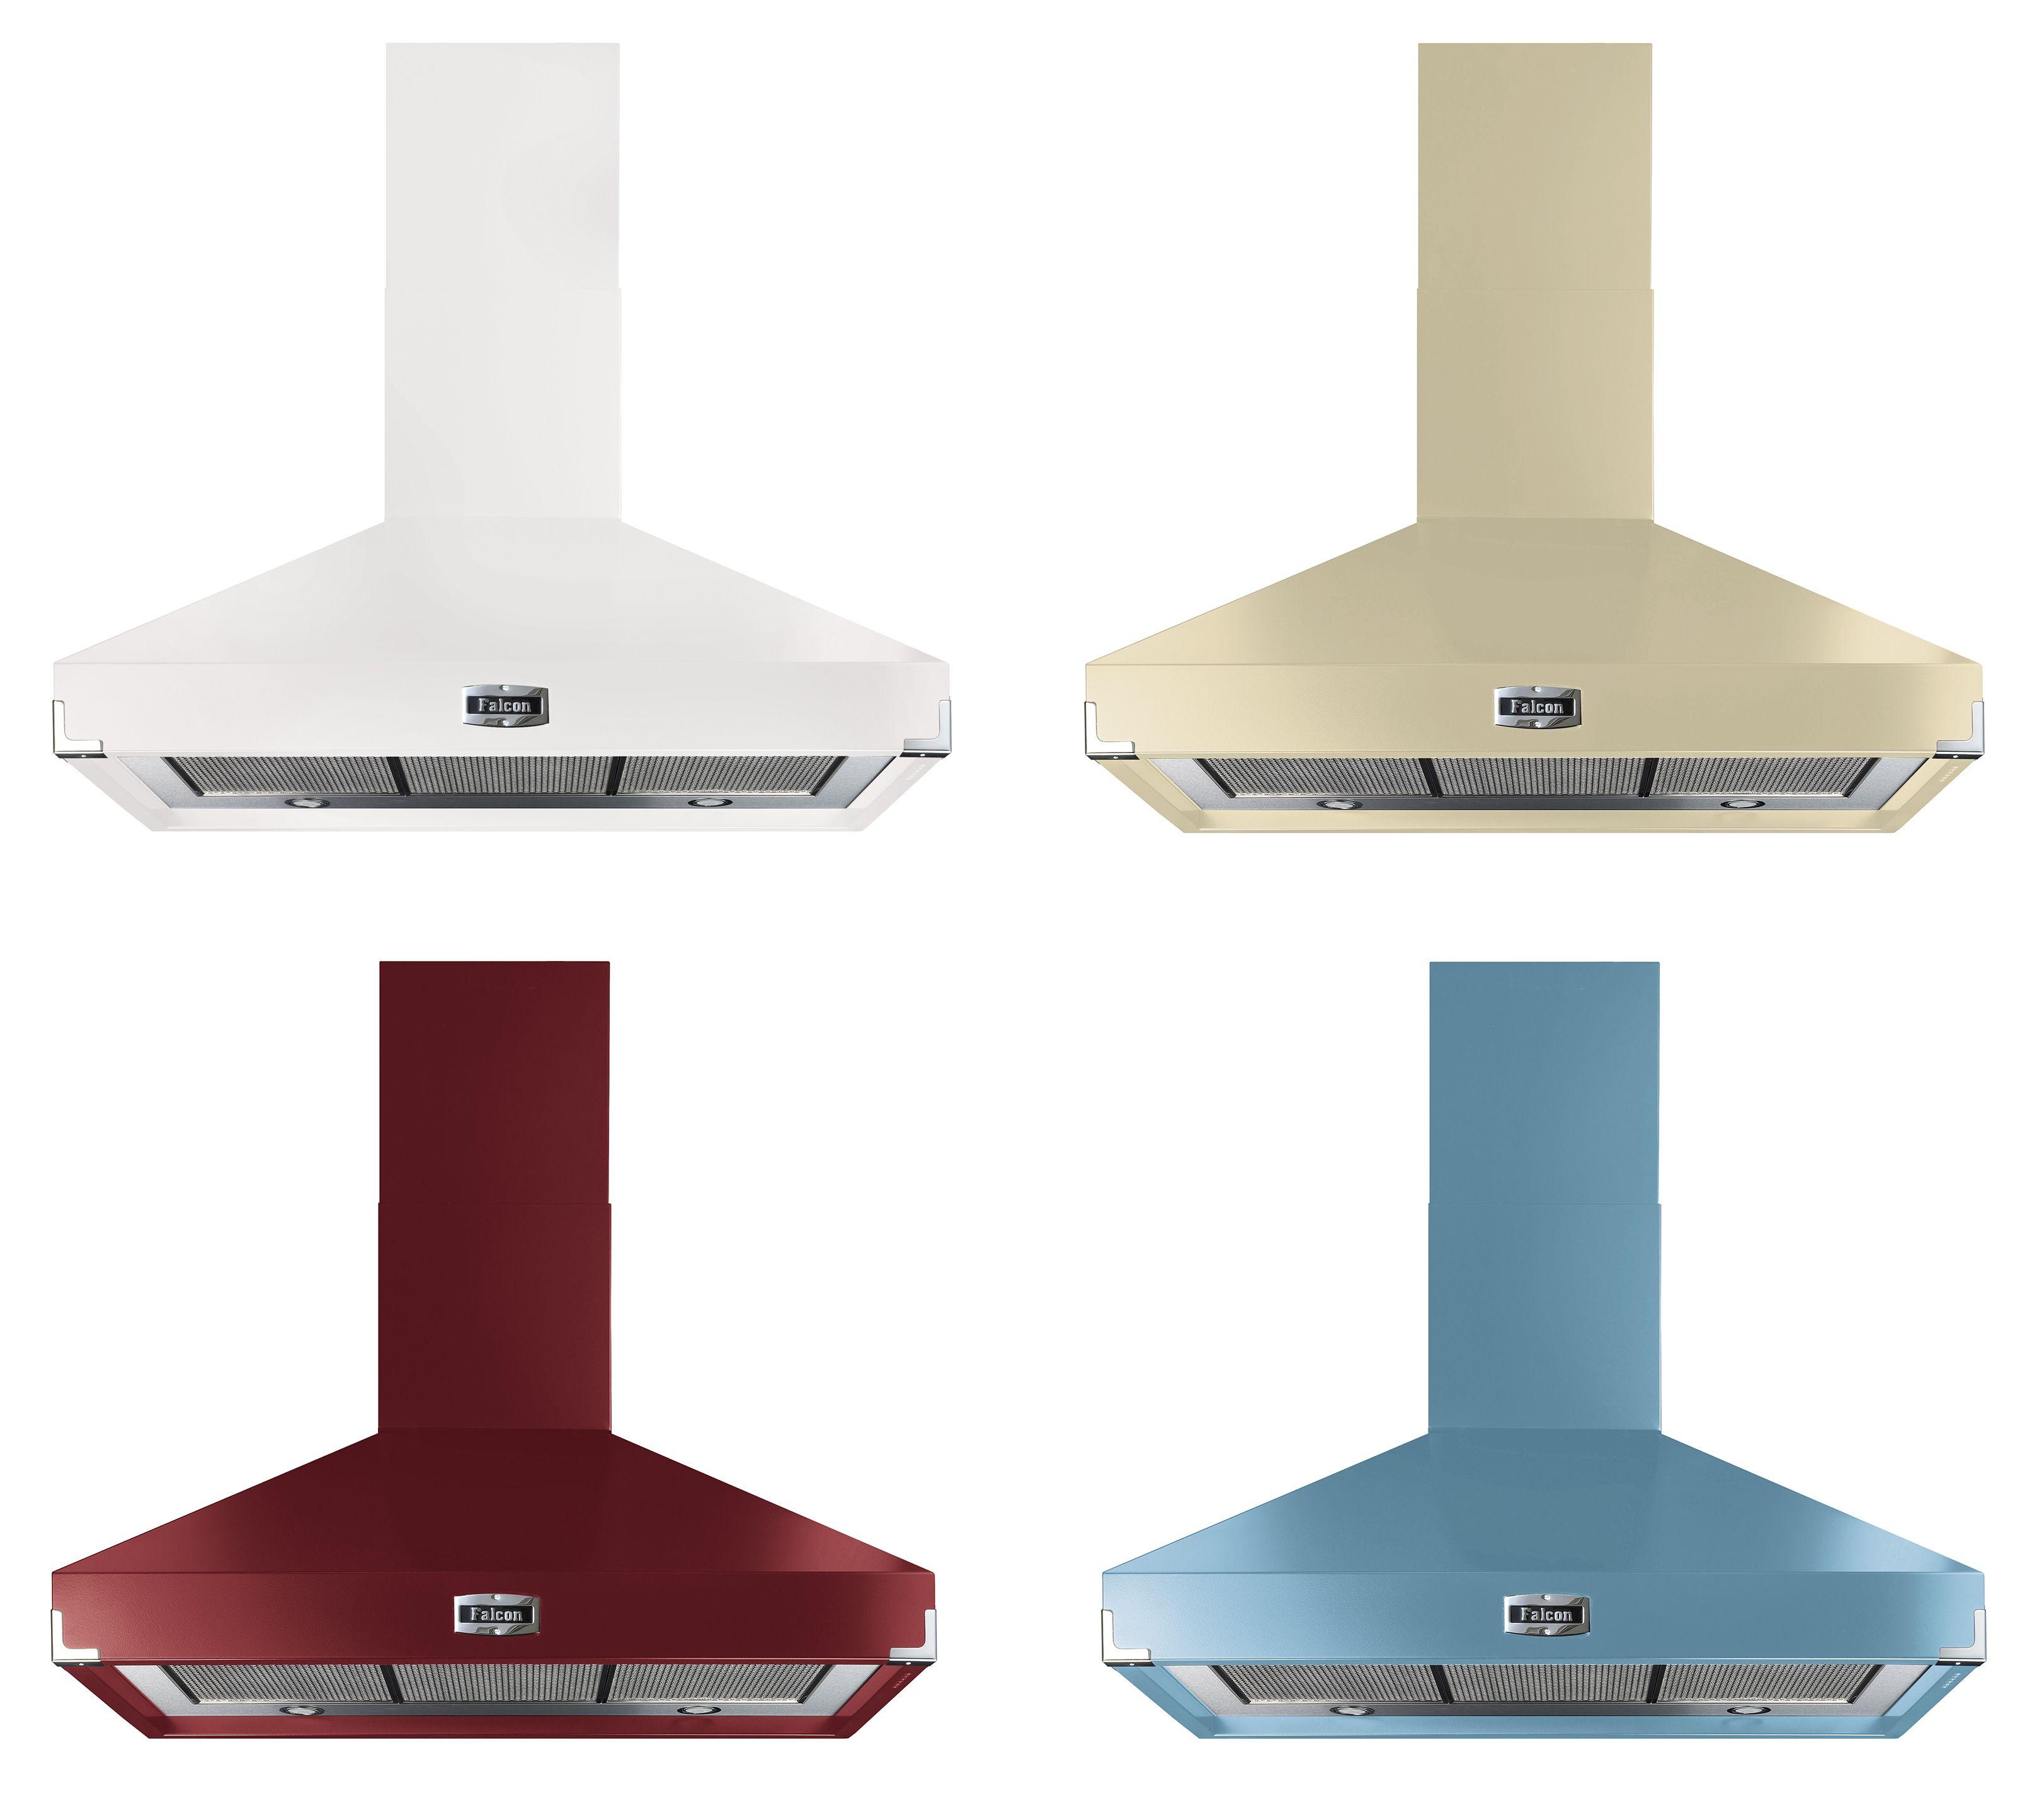 Voor welke kleur afzuigkap zou jij gaan falcon fornuizen pinterest afzuigkap ovens en kleur - Keuken bulthaup catalogus ...